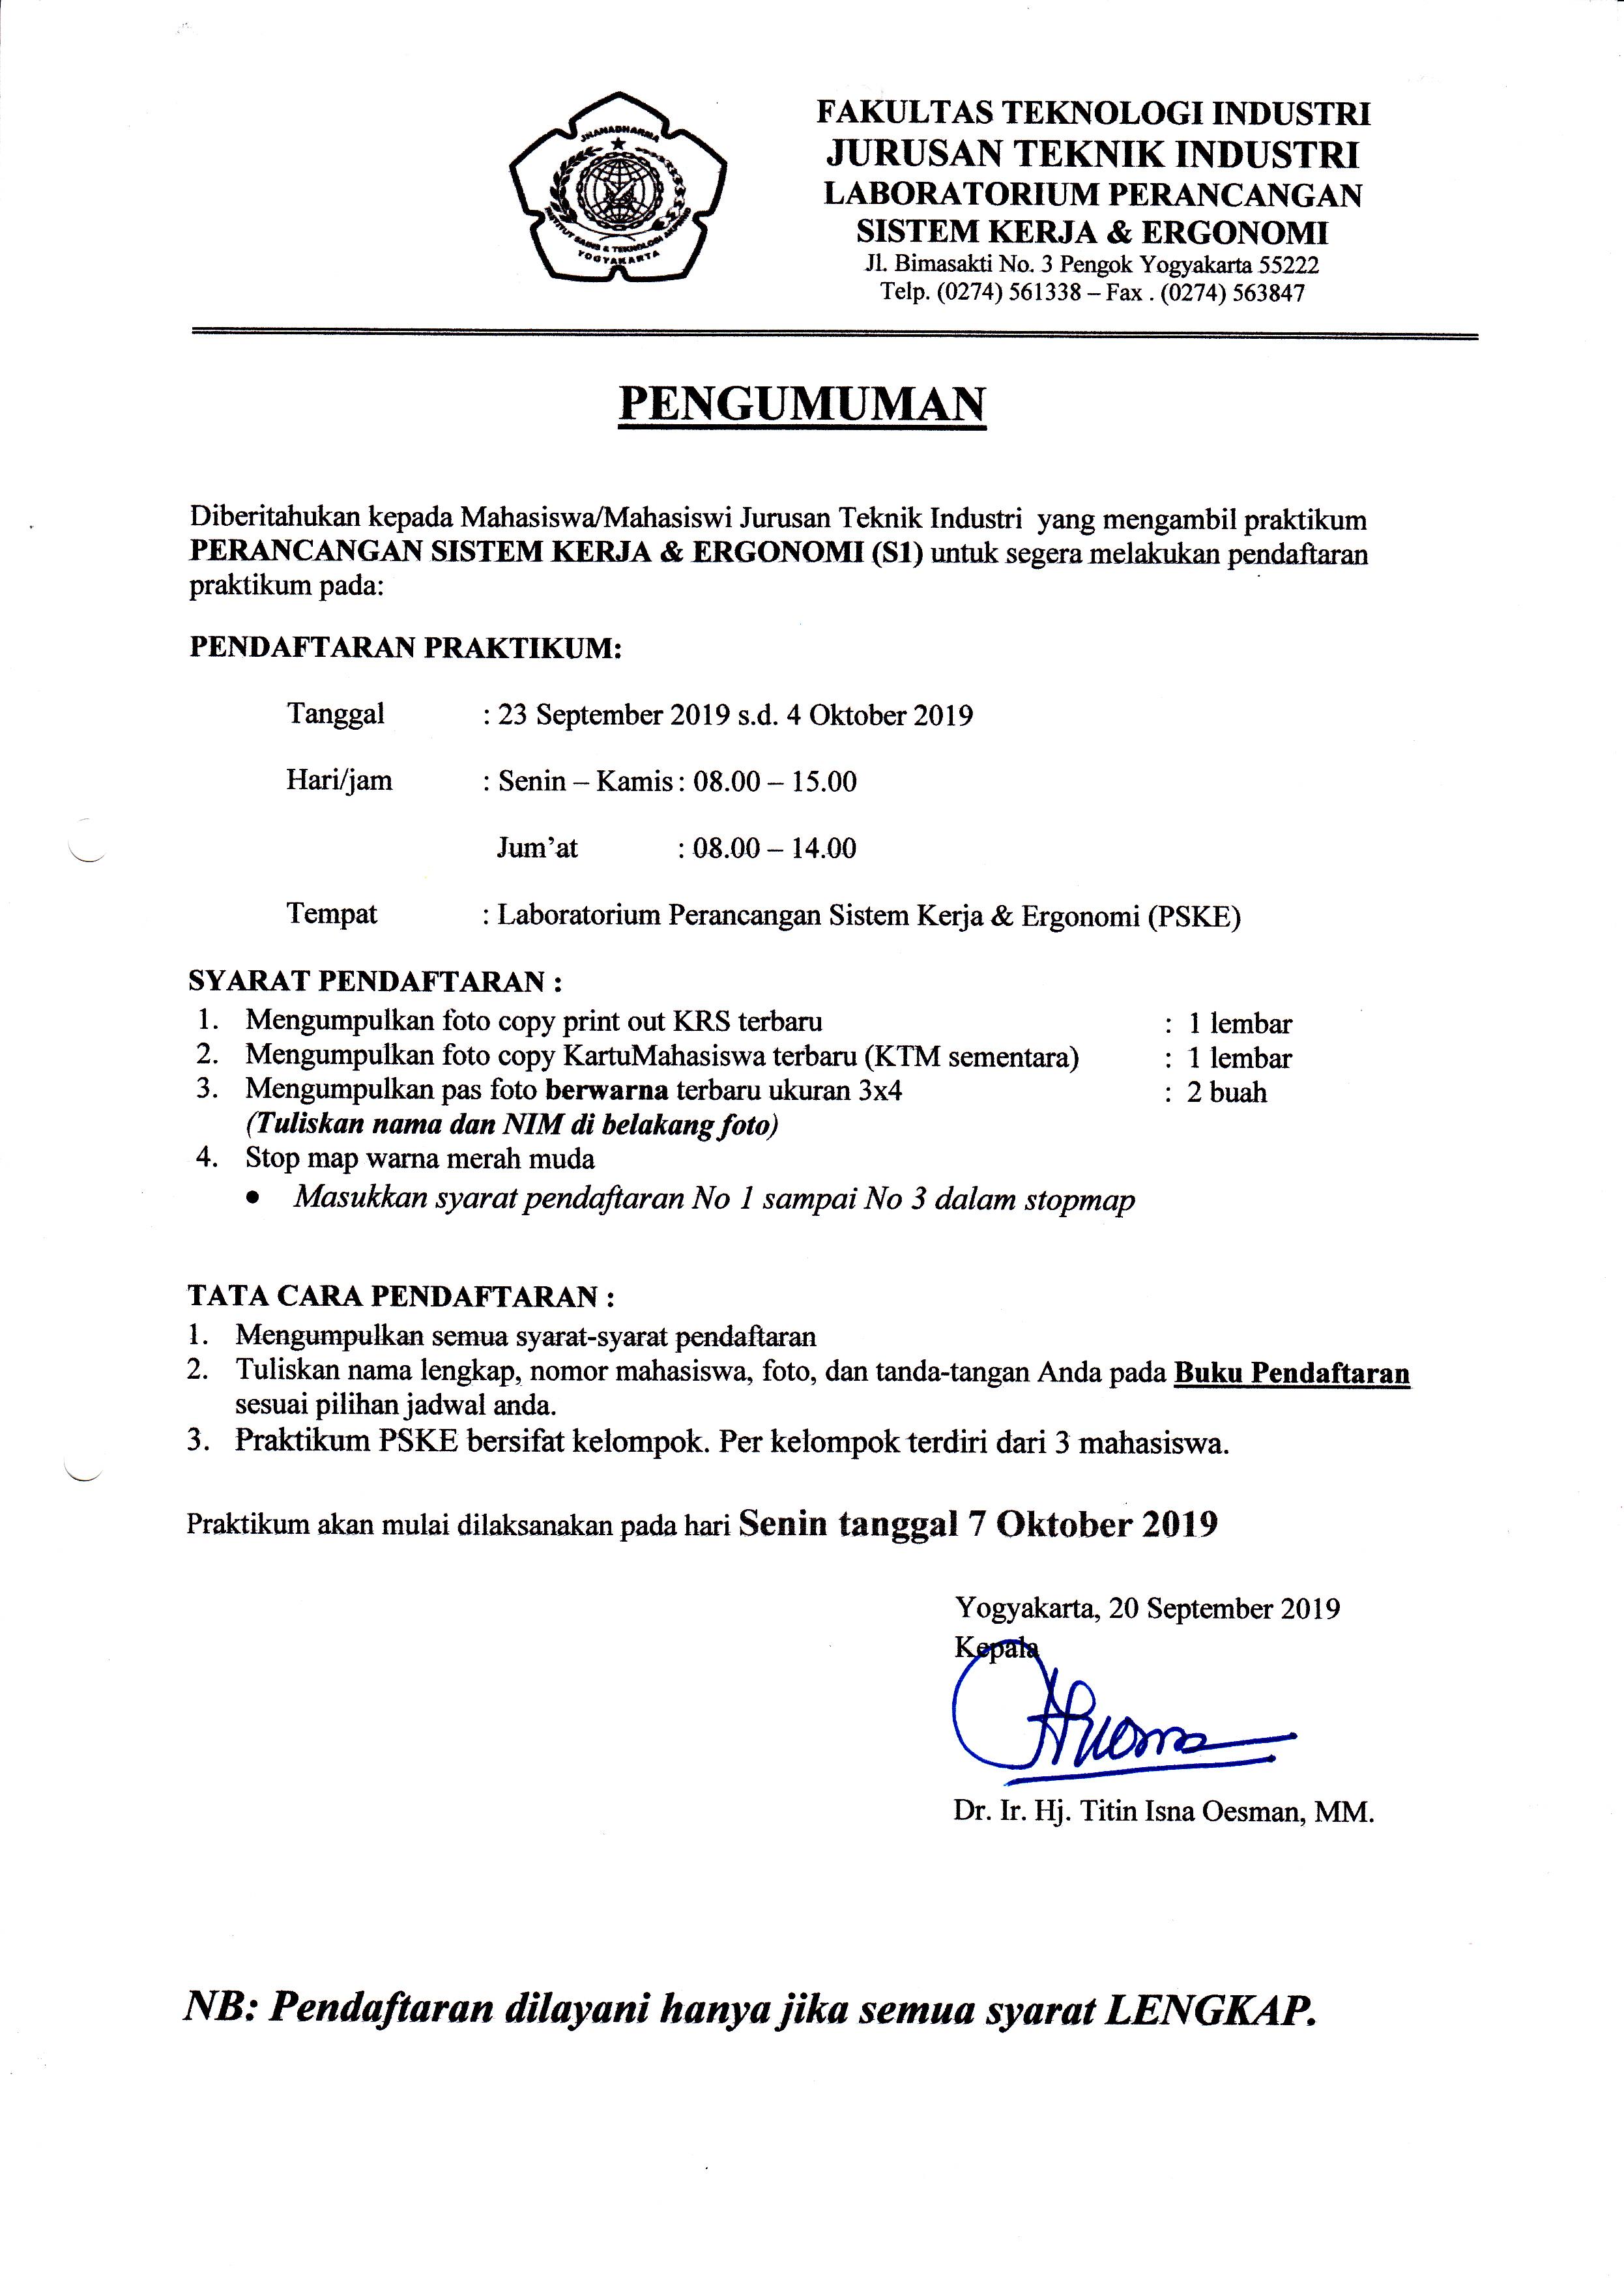 Pendaftaran Praktikum ergonomi Sem Ganjil 2019-2020